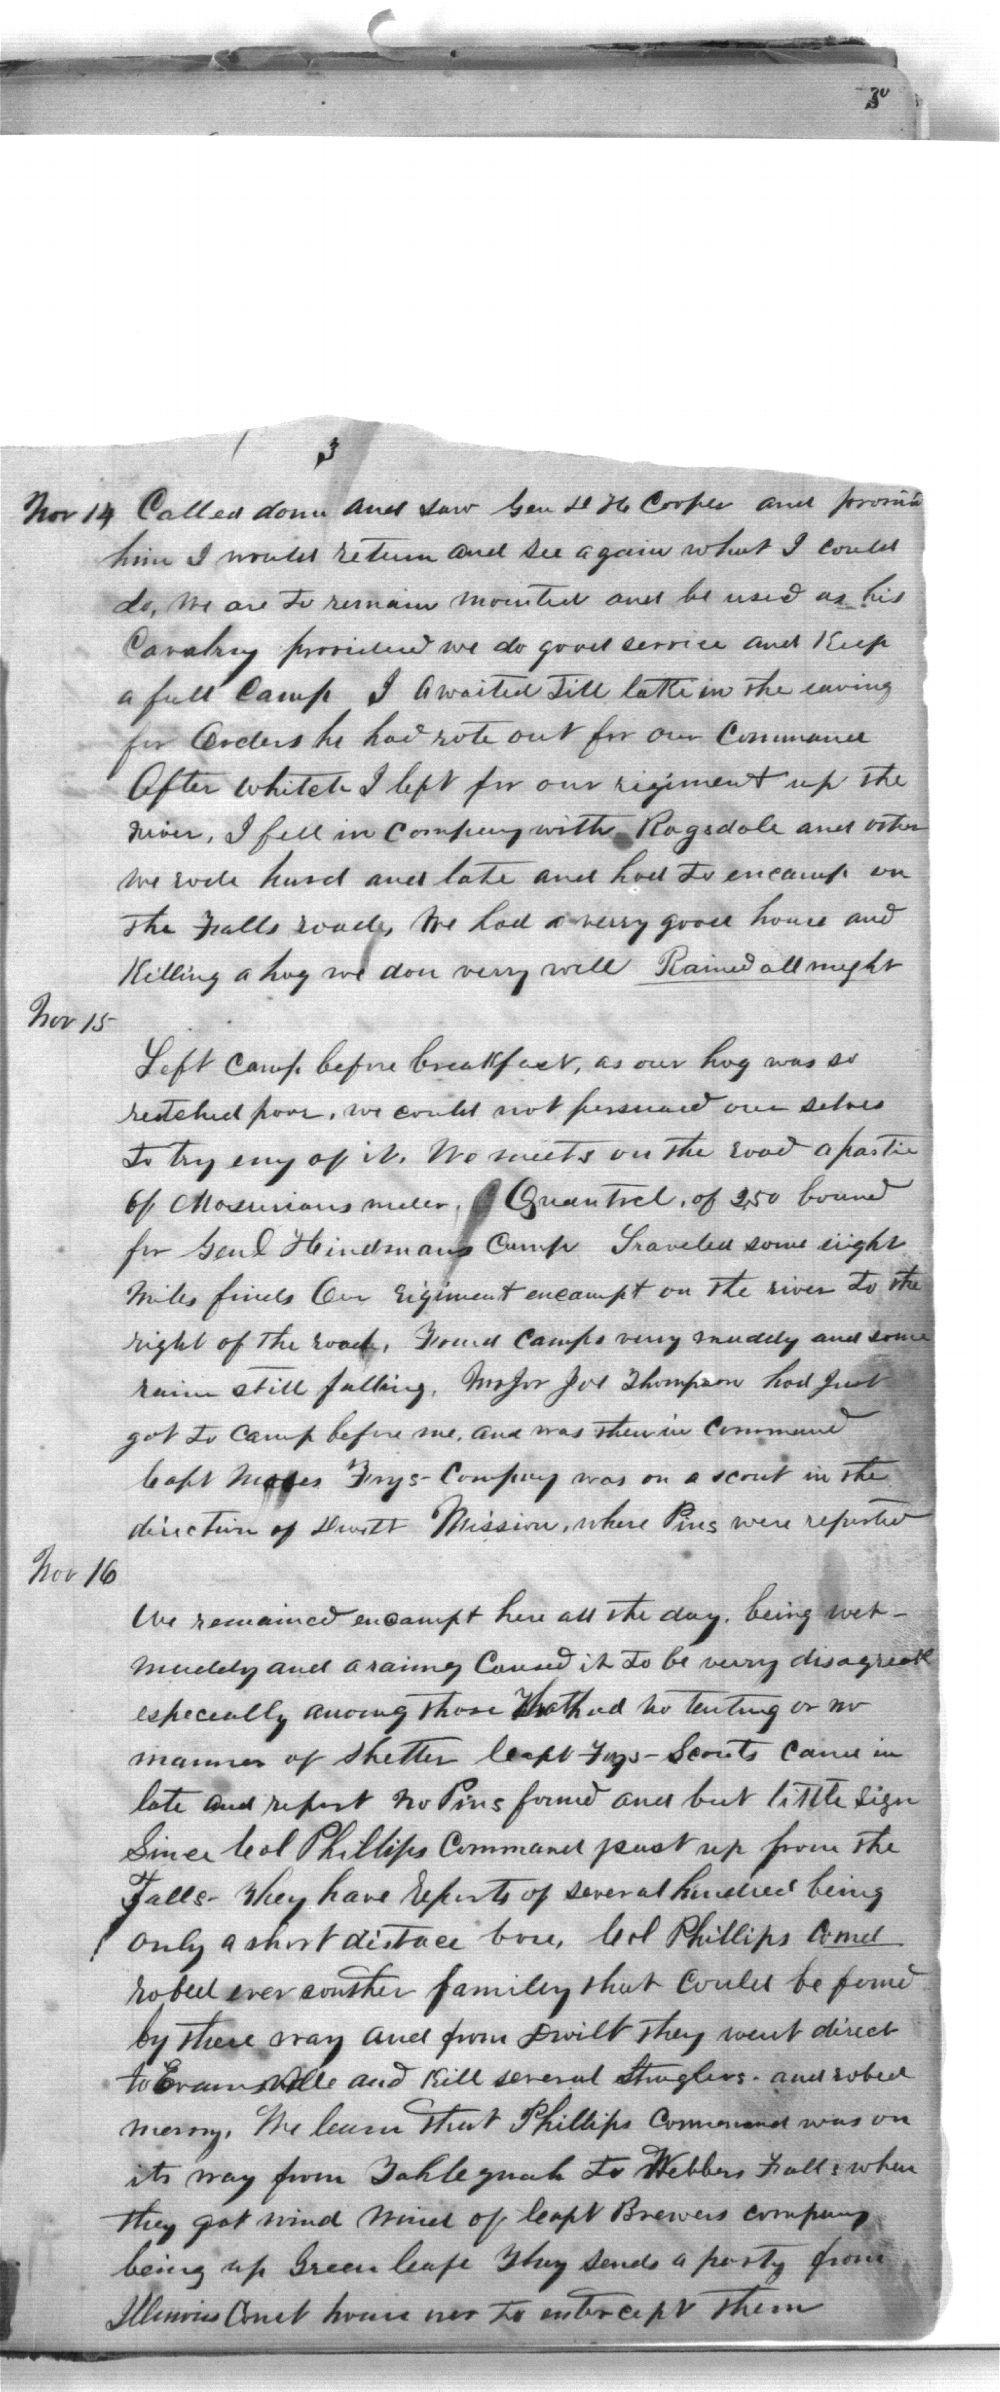 First Cherokee Regiment day book - 3